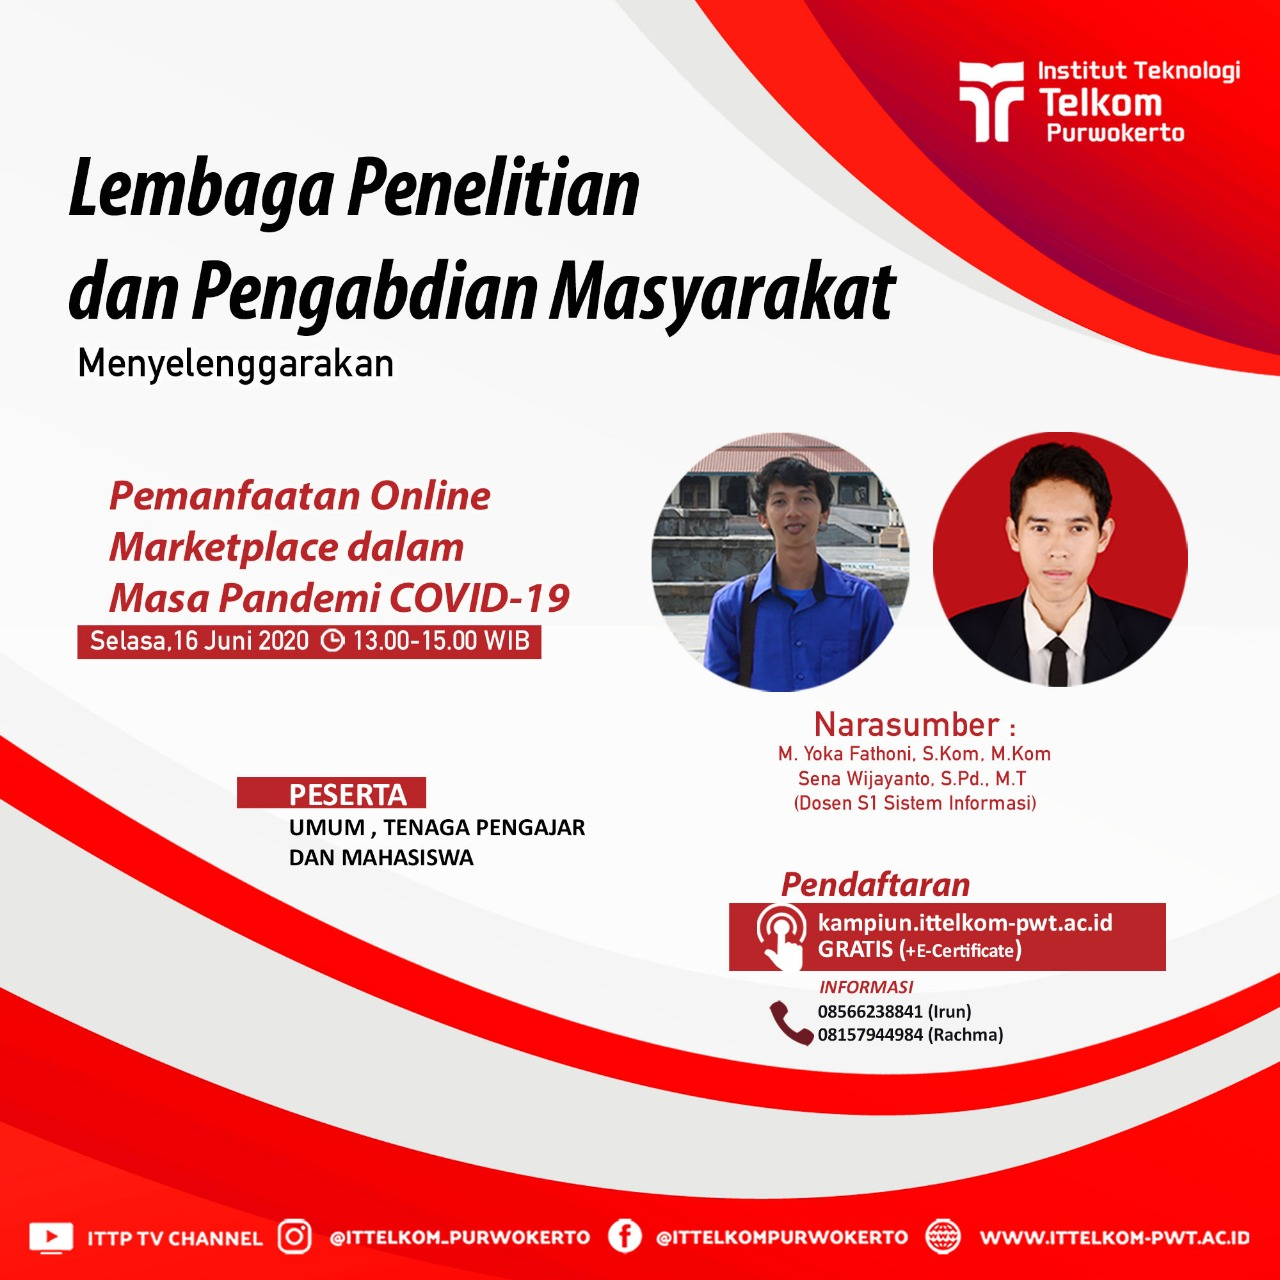 Pemanfaatan Online Marketplace dalam Masa Pandemi COVID-19